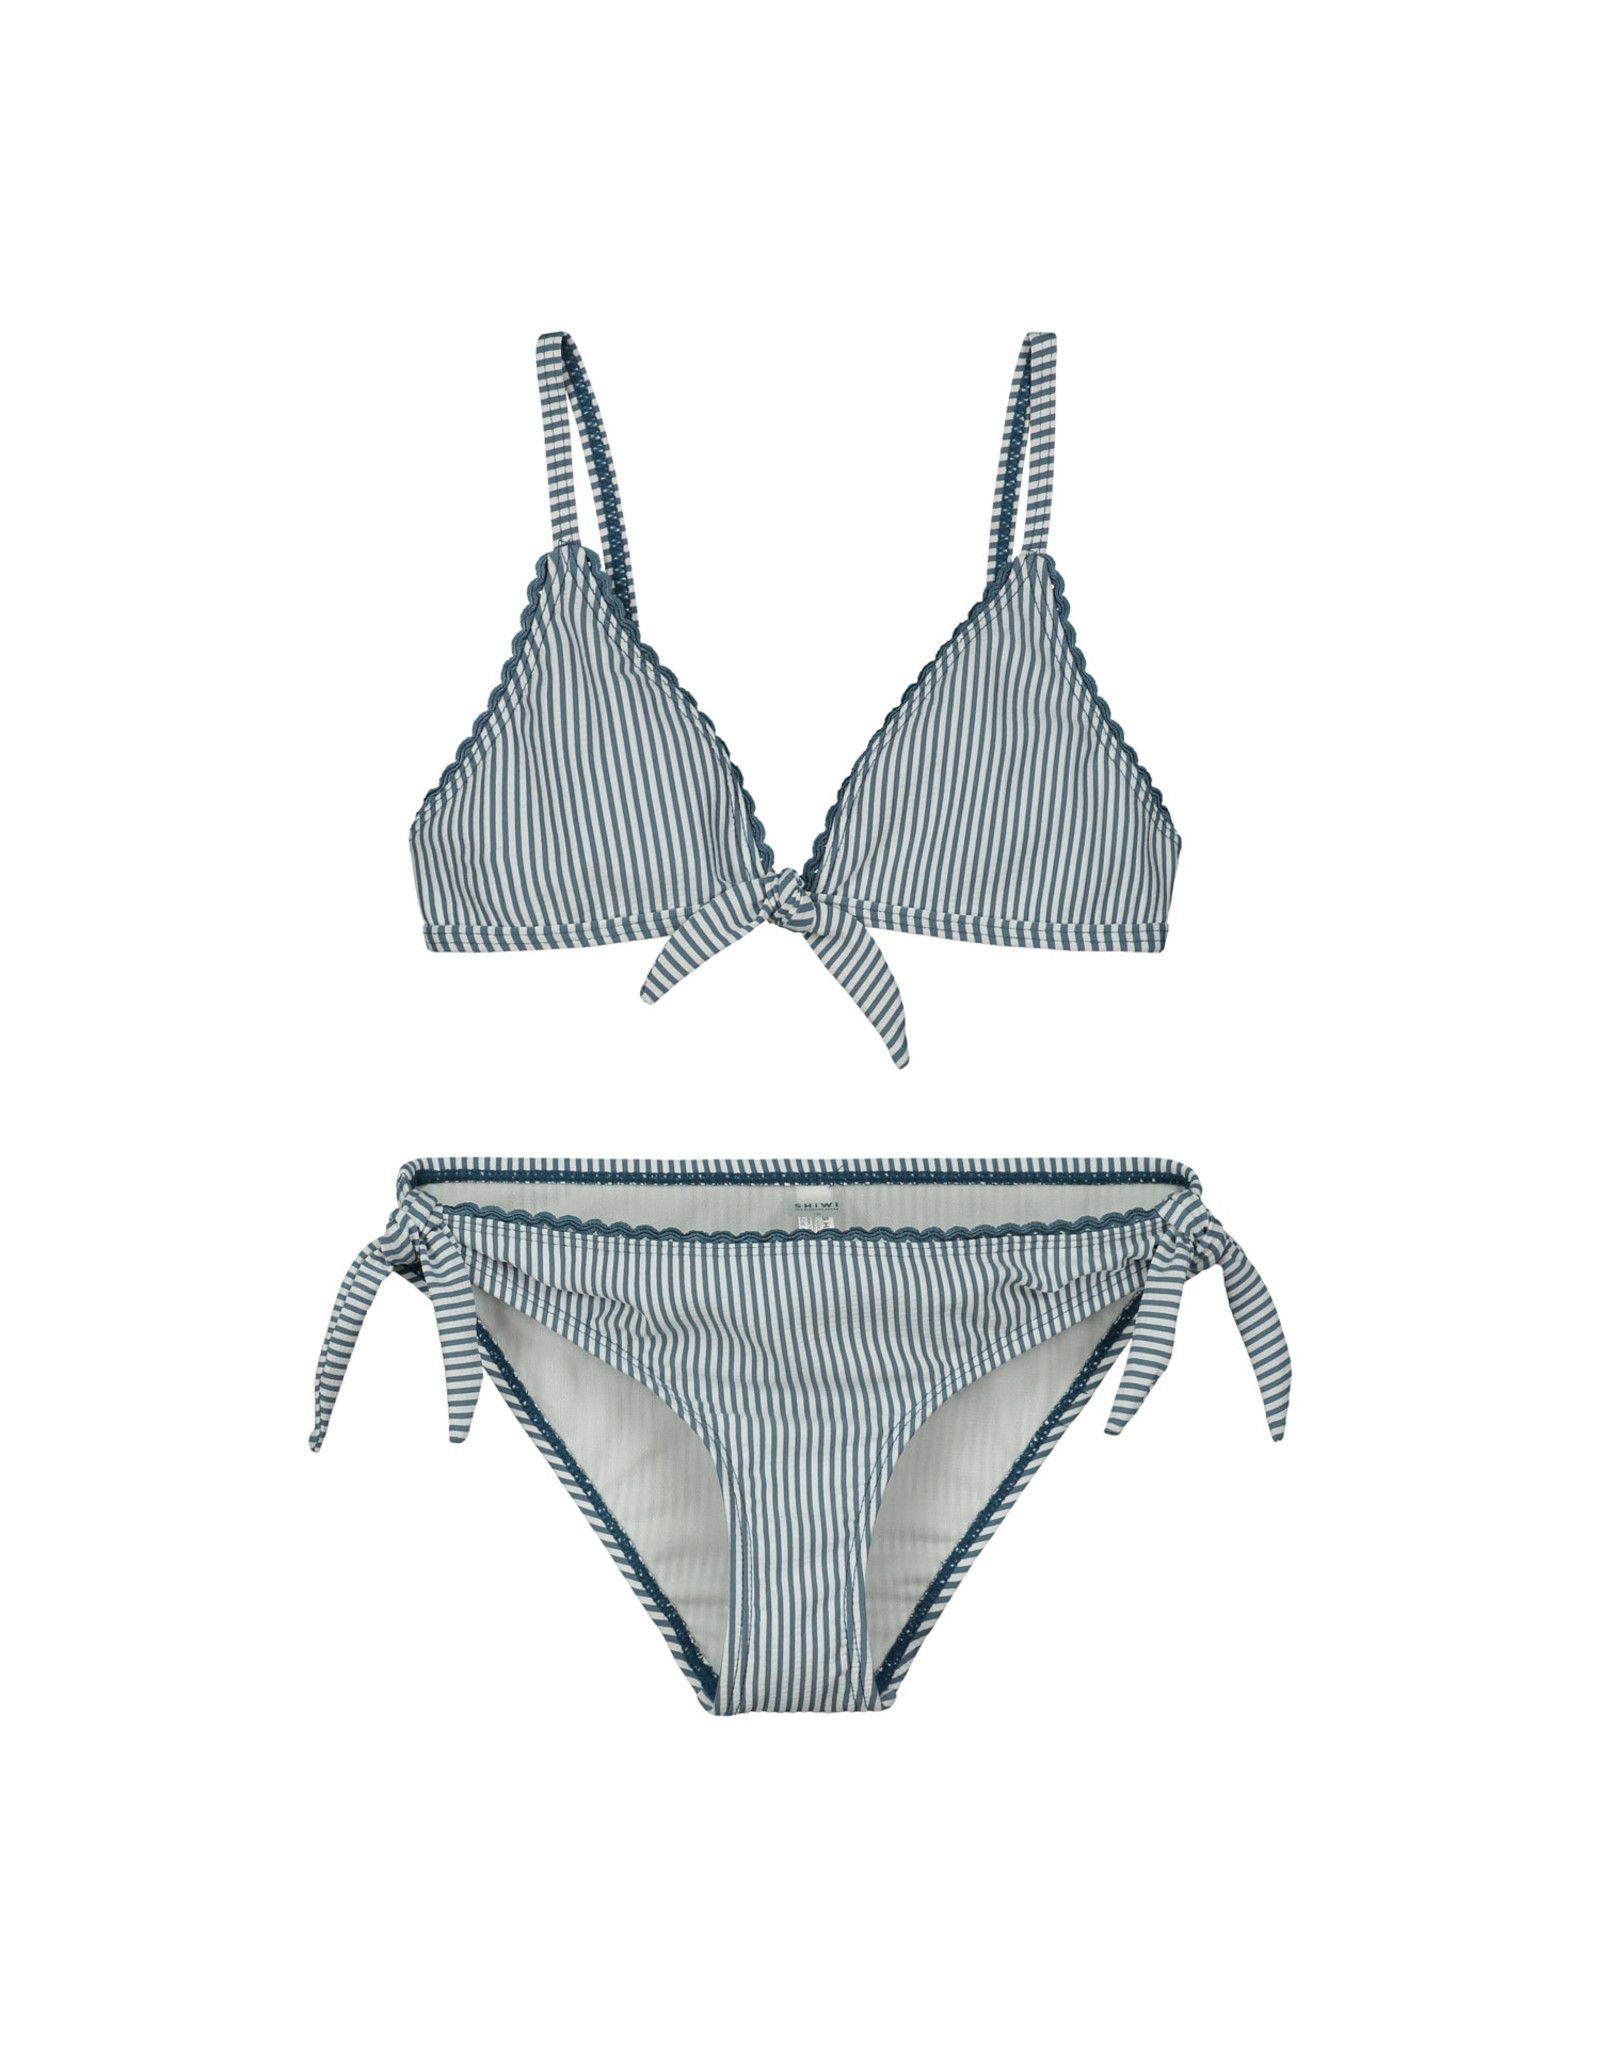 Shiwi girls cote d'azur knotted triangle bikini patagonia blue